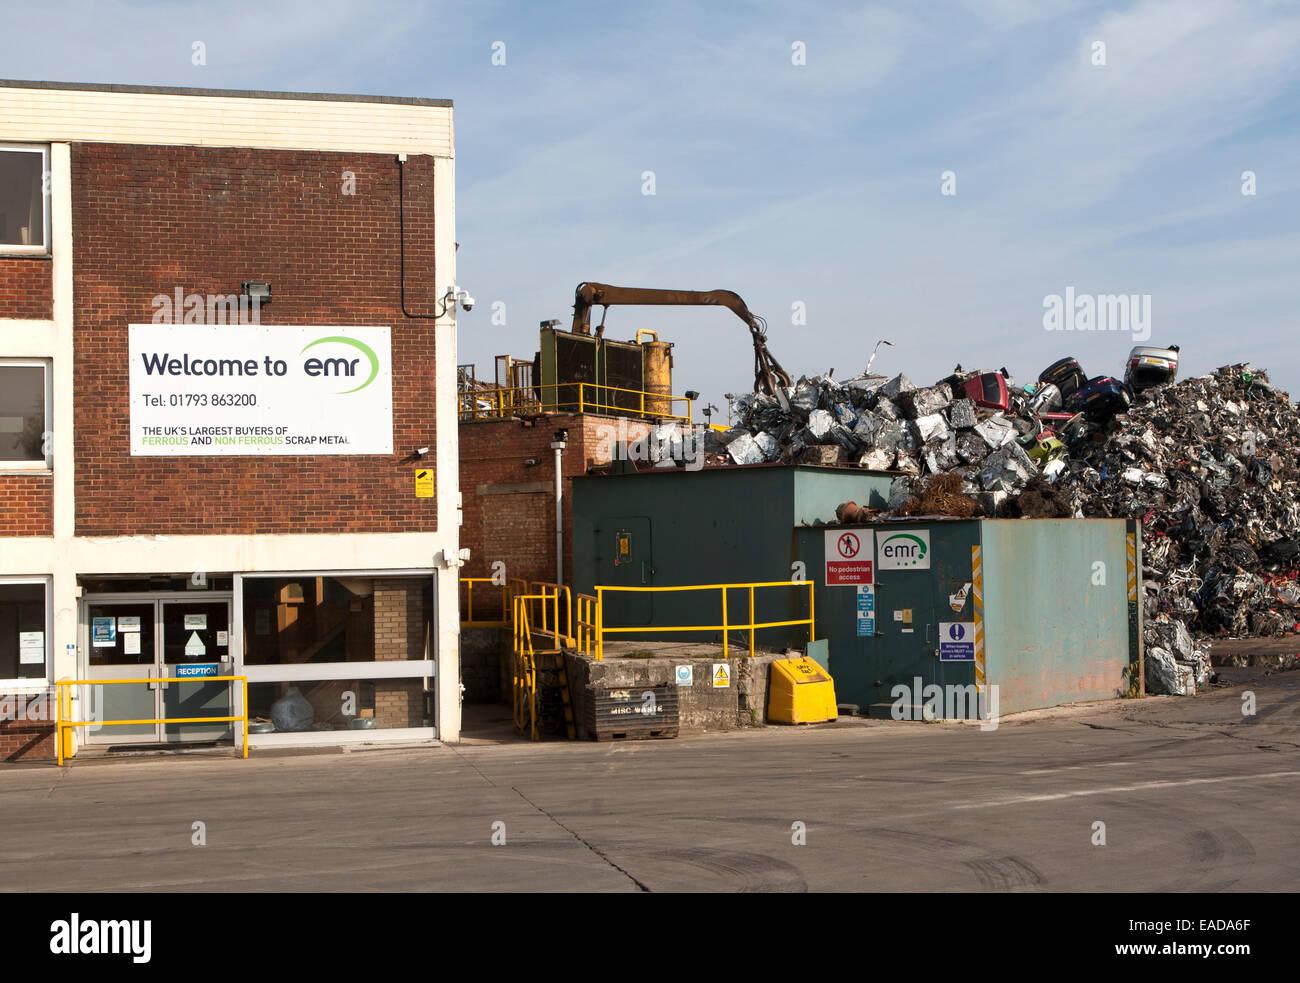 Scrap metal recycling EMR company, Swindon, England, UK Stock Photo